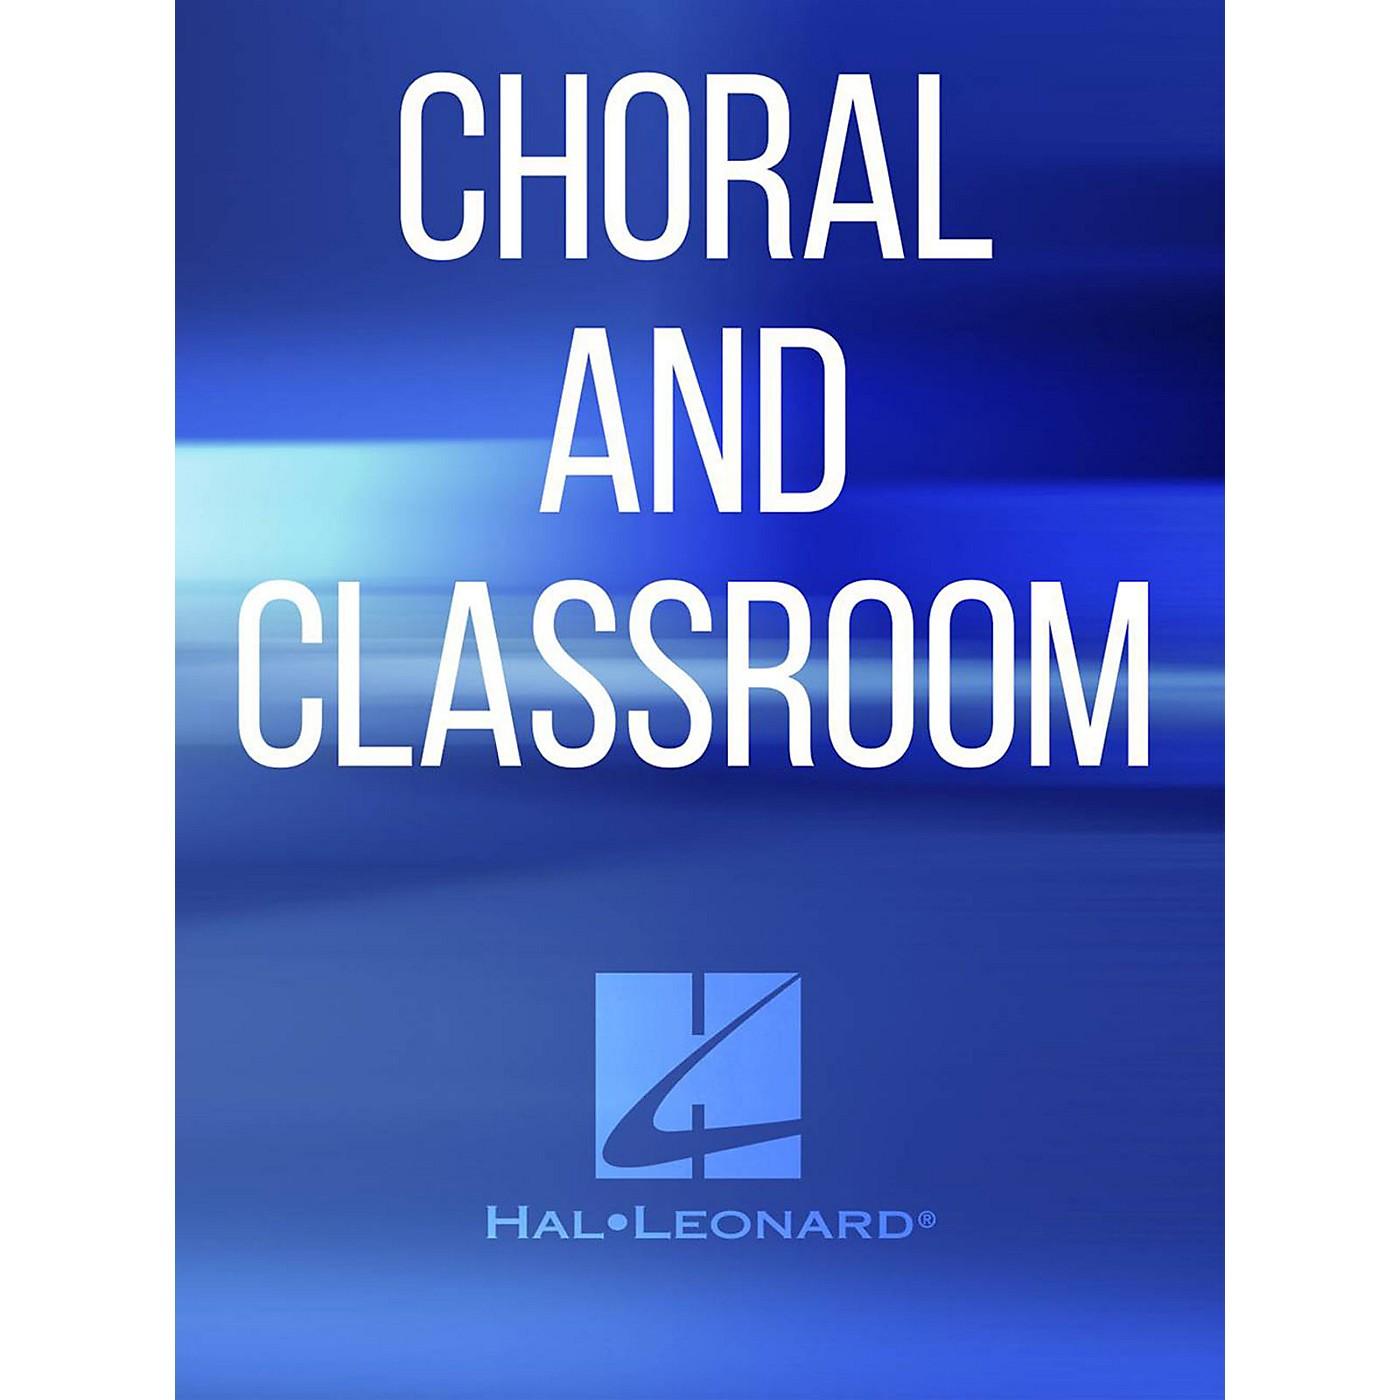 Hal Leonard Paddy Works On The Railroad TTBB Composed by Vijay Singh thumbnail